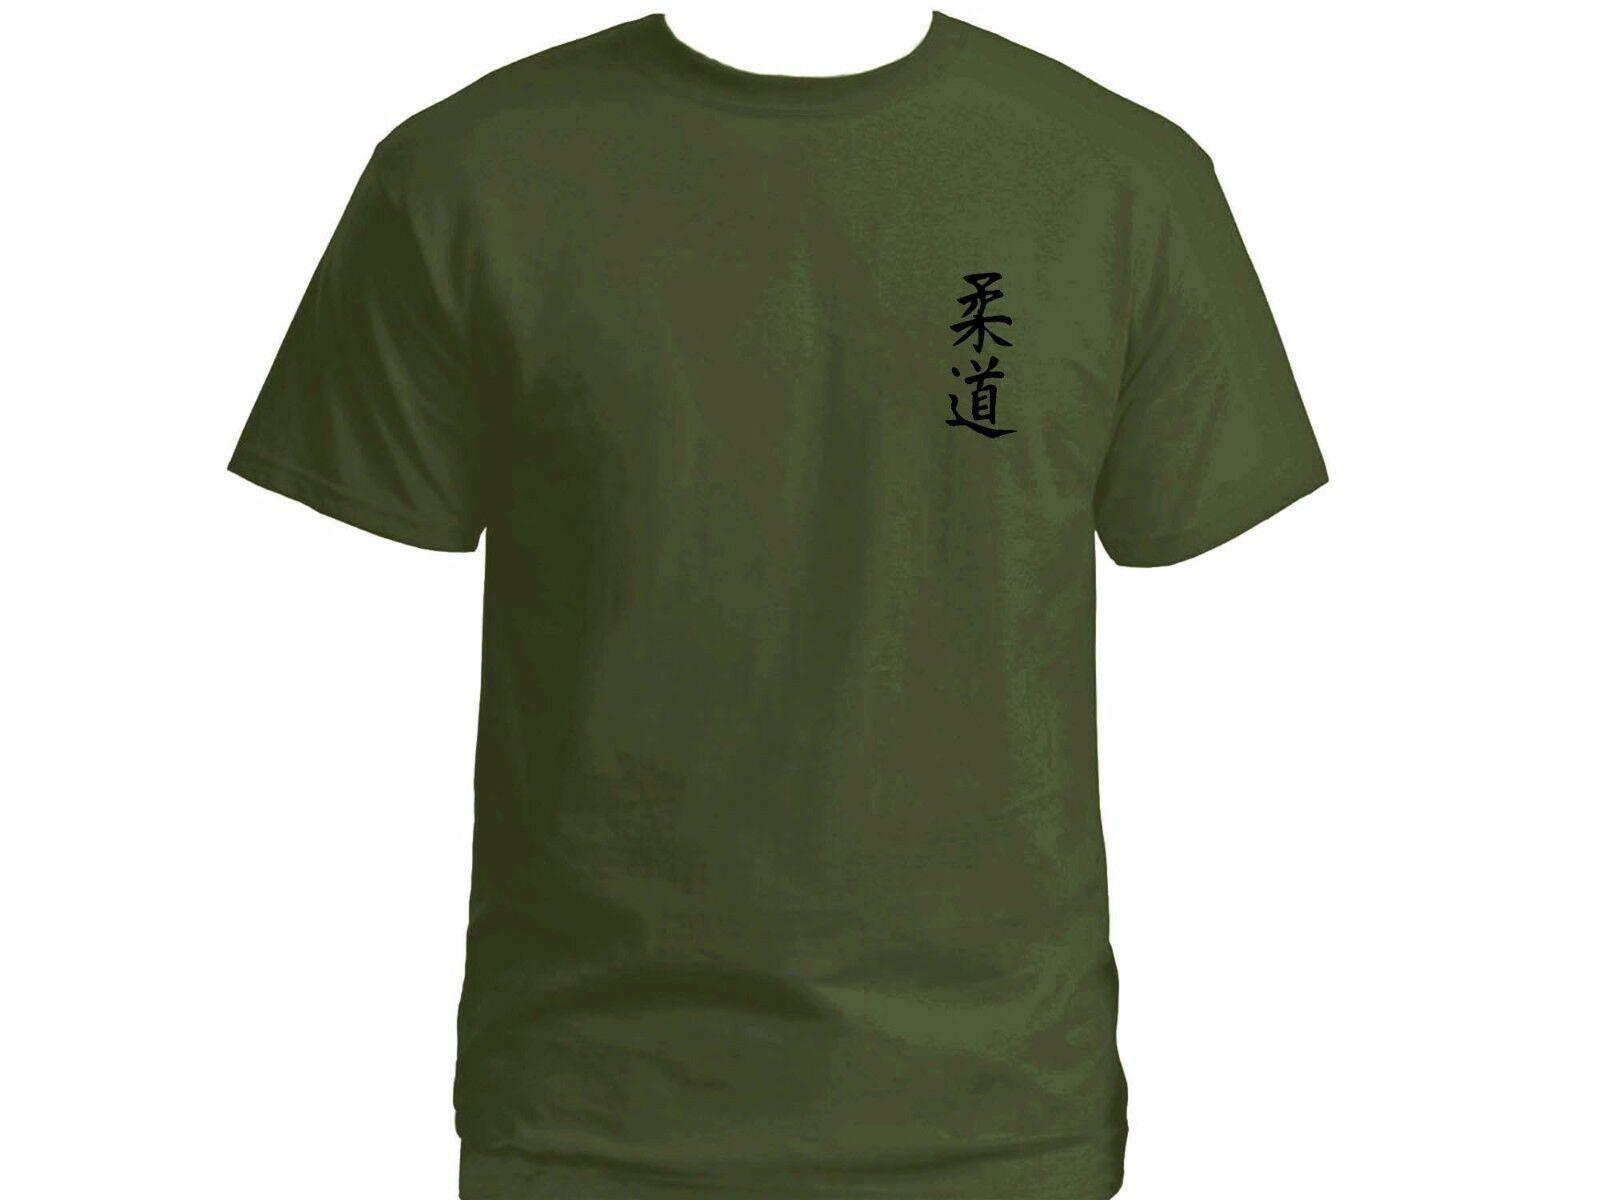 Judo Ju Do Japanese Hieroglyph Martial Arts Mma 100 Cotton Olive Green T Shirt Men Women Unisex Fashion Tshirt Free Shipping